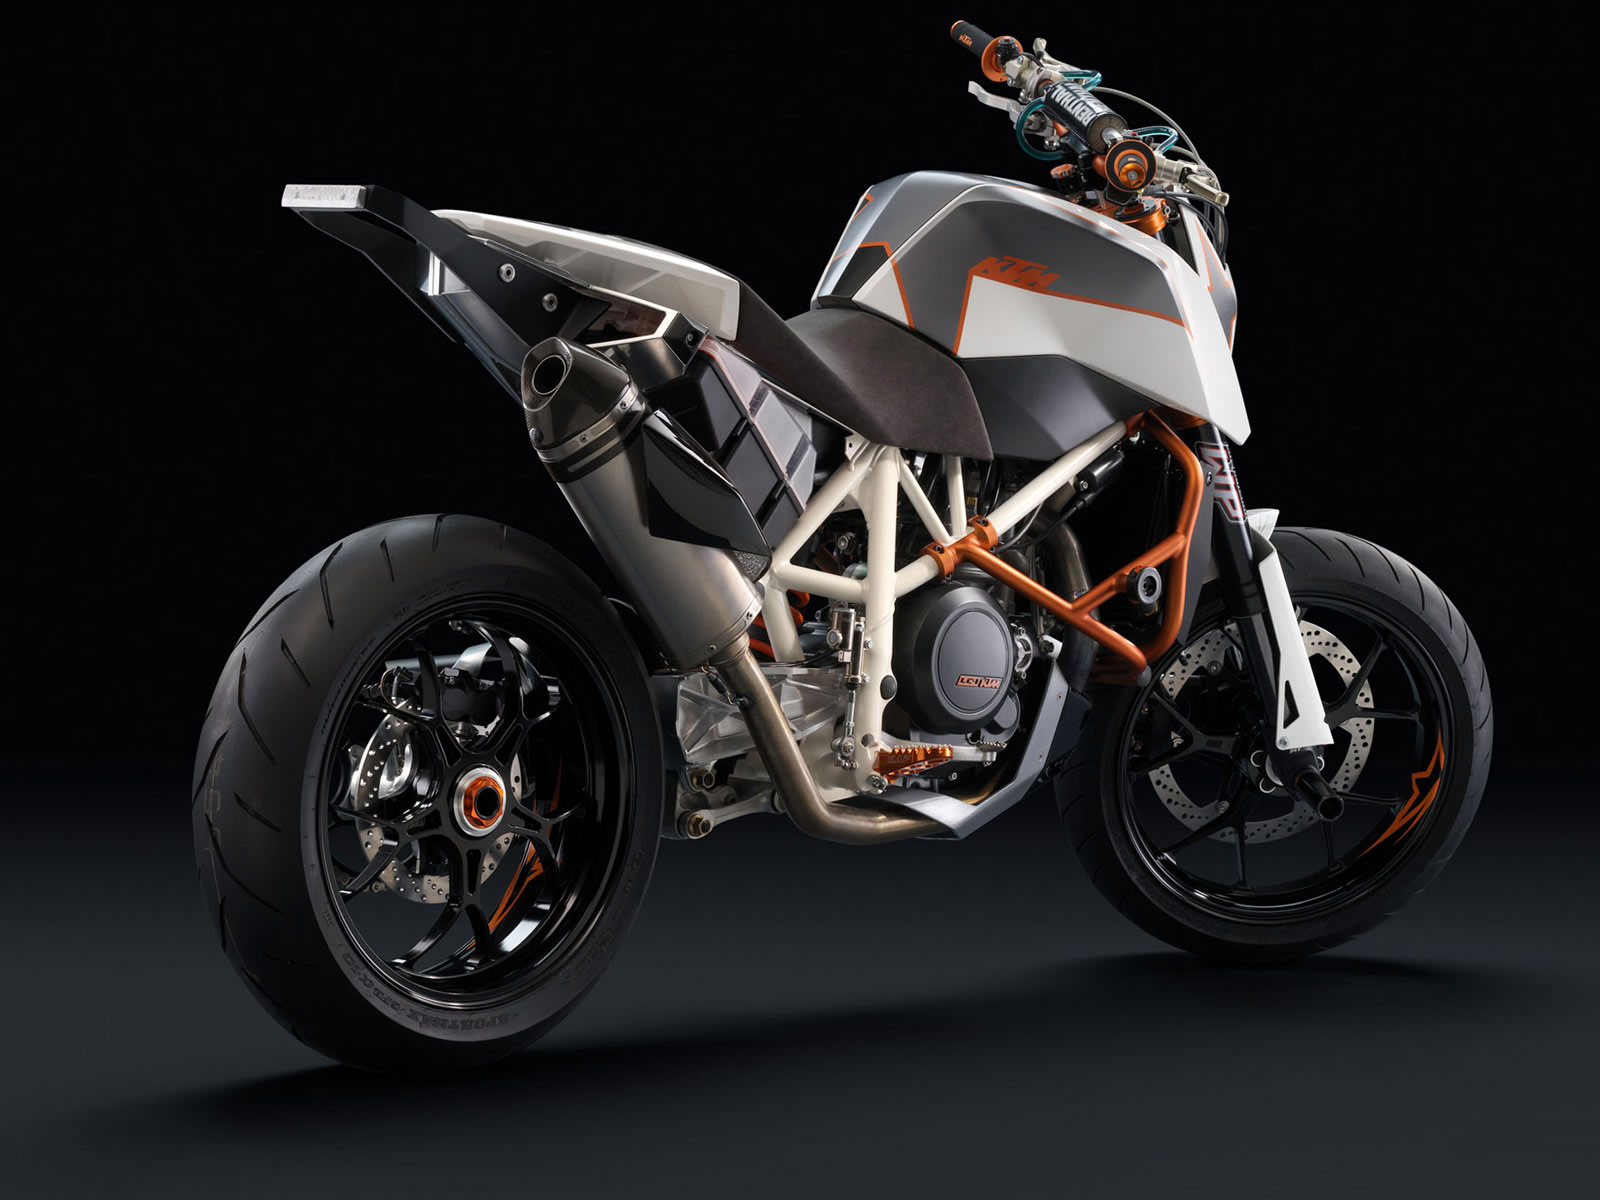 Black Trellis Wallpaper 2008 Ktm 690 Stunt Concept Motorcycle Accident Lawyers Info